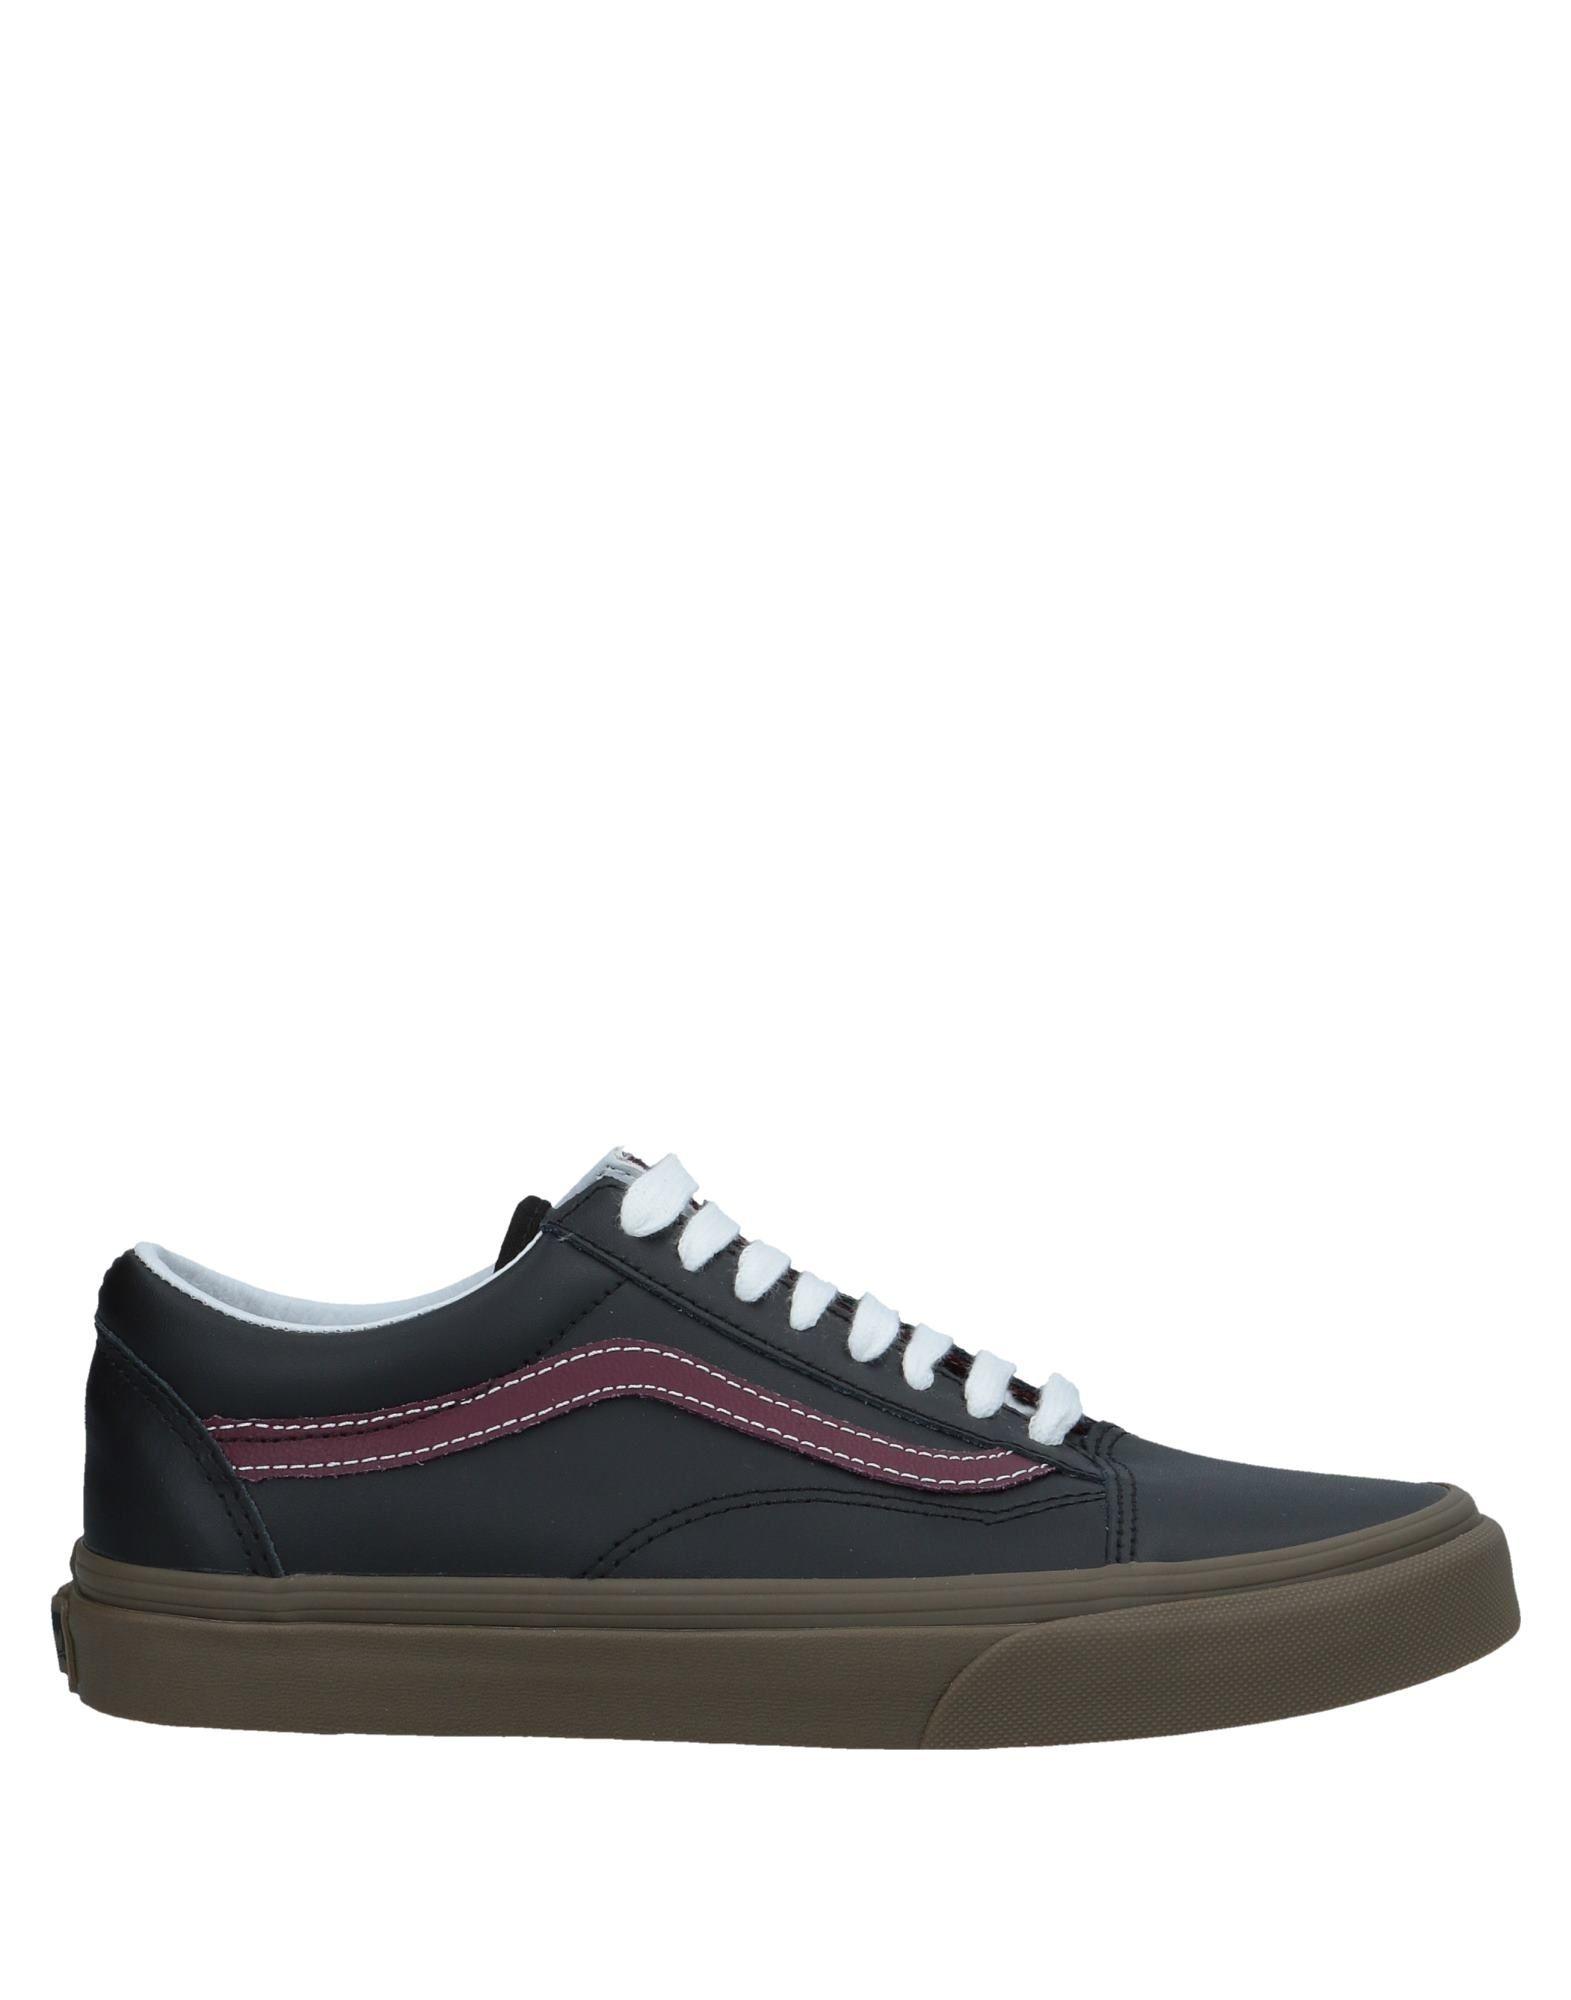 Moda Sneakers Sneakers Moda Vans Donna - 11508563FT c9f43e